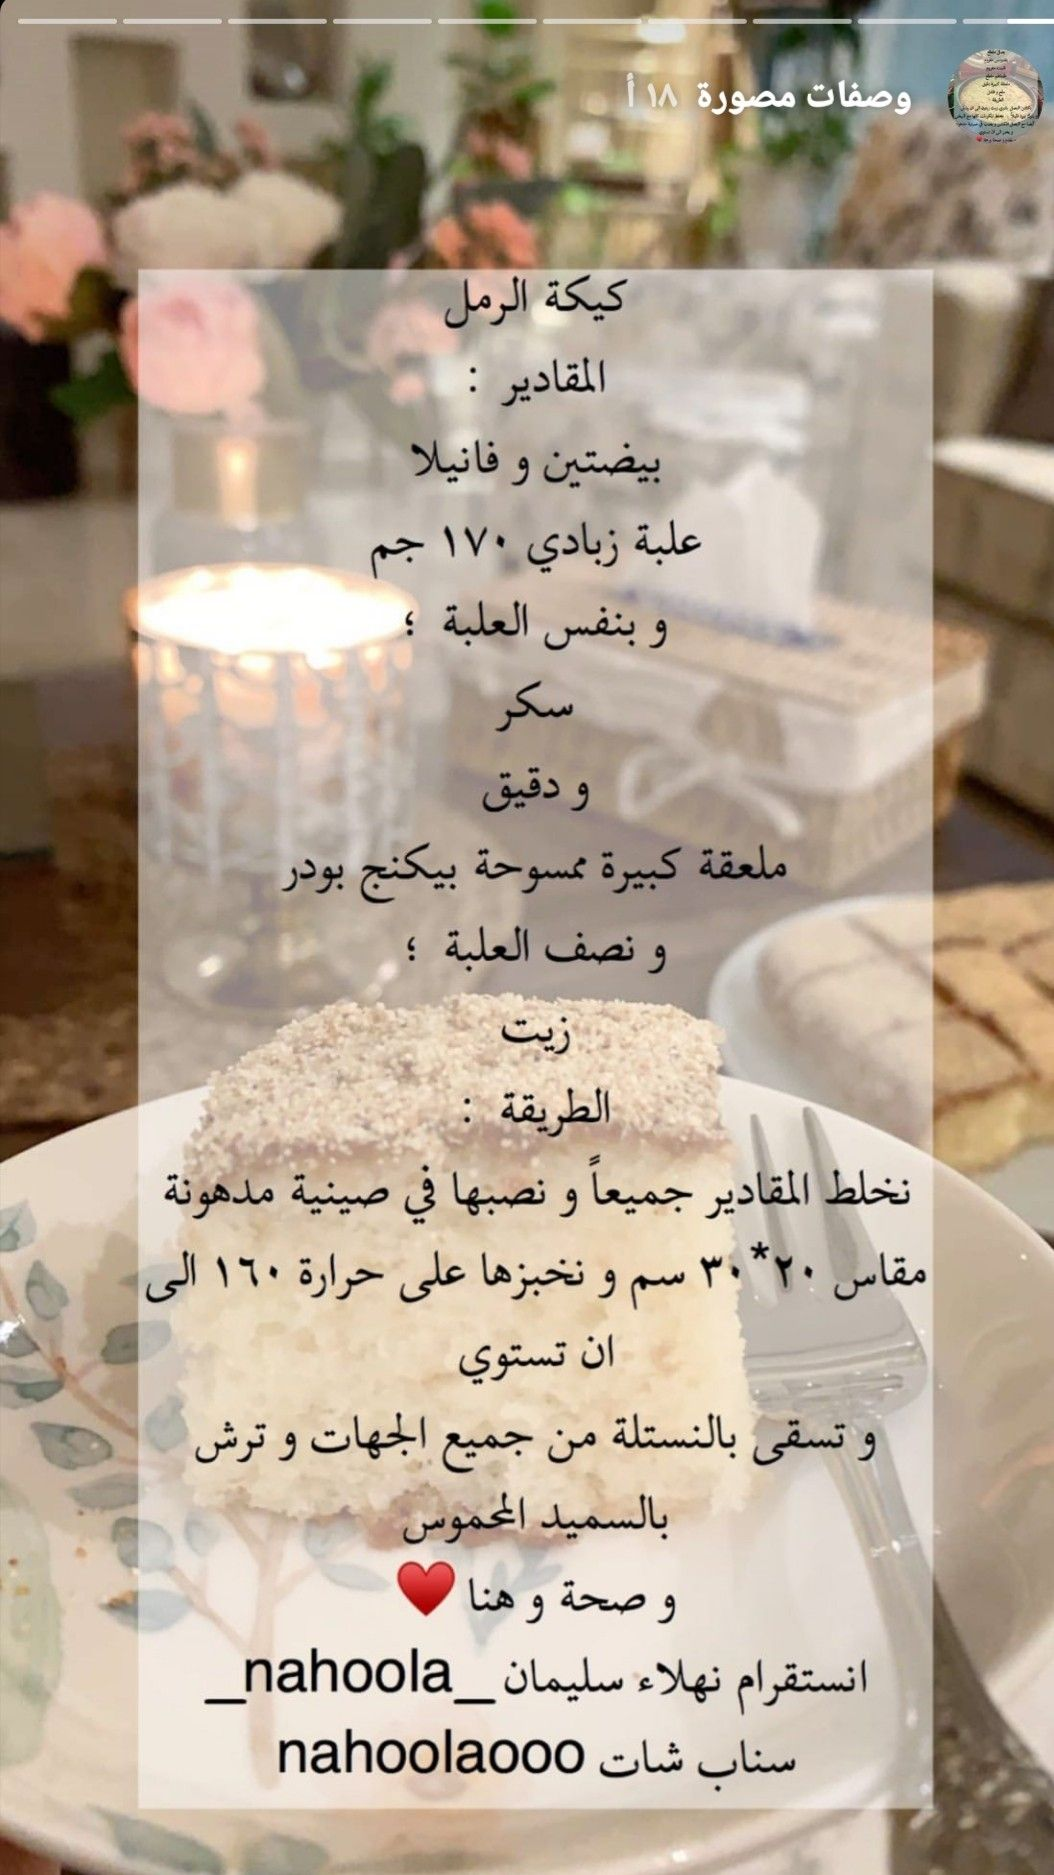 Pin By Nawal Alkhudari On Food طبخ Cooking Recipes Desserts Food Recipies Recipes